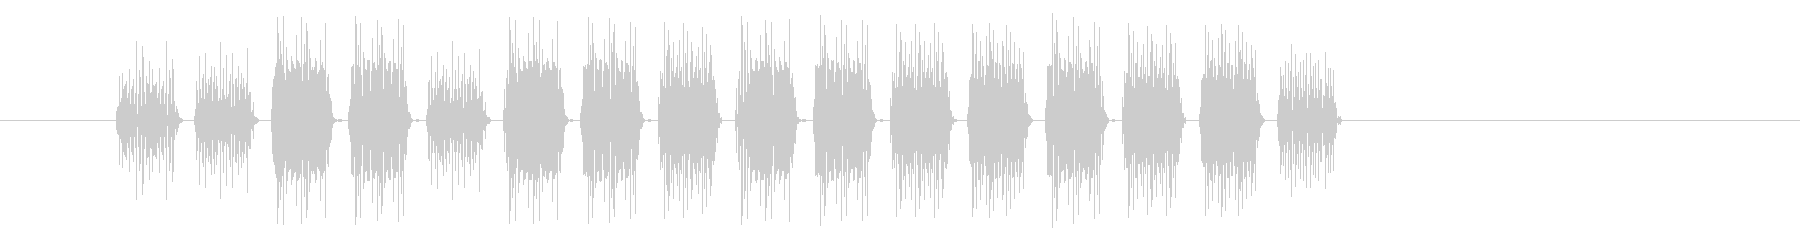 NES RPG A12-2(エンカウントの未再生の波形